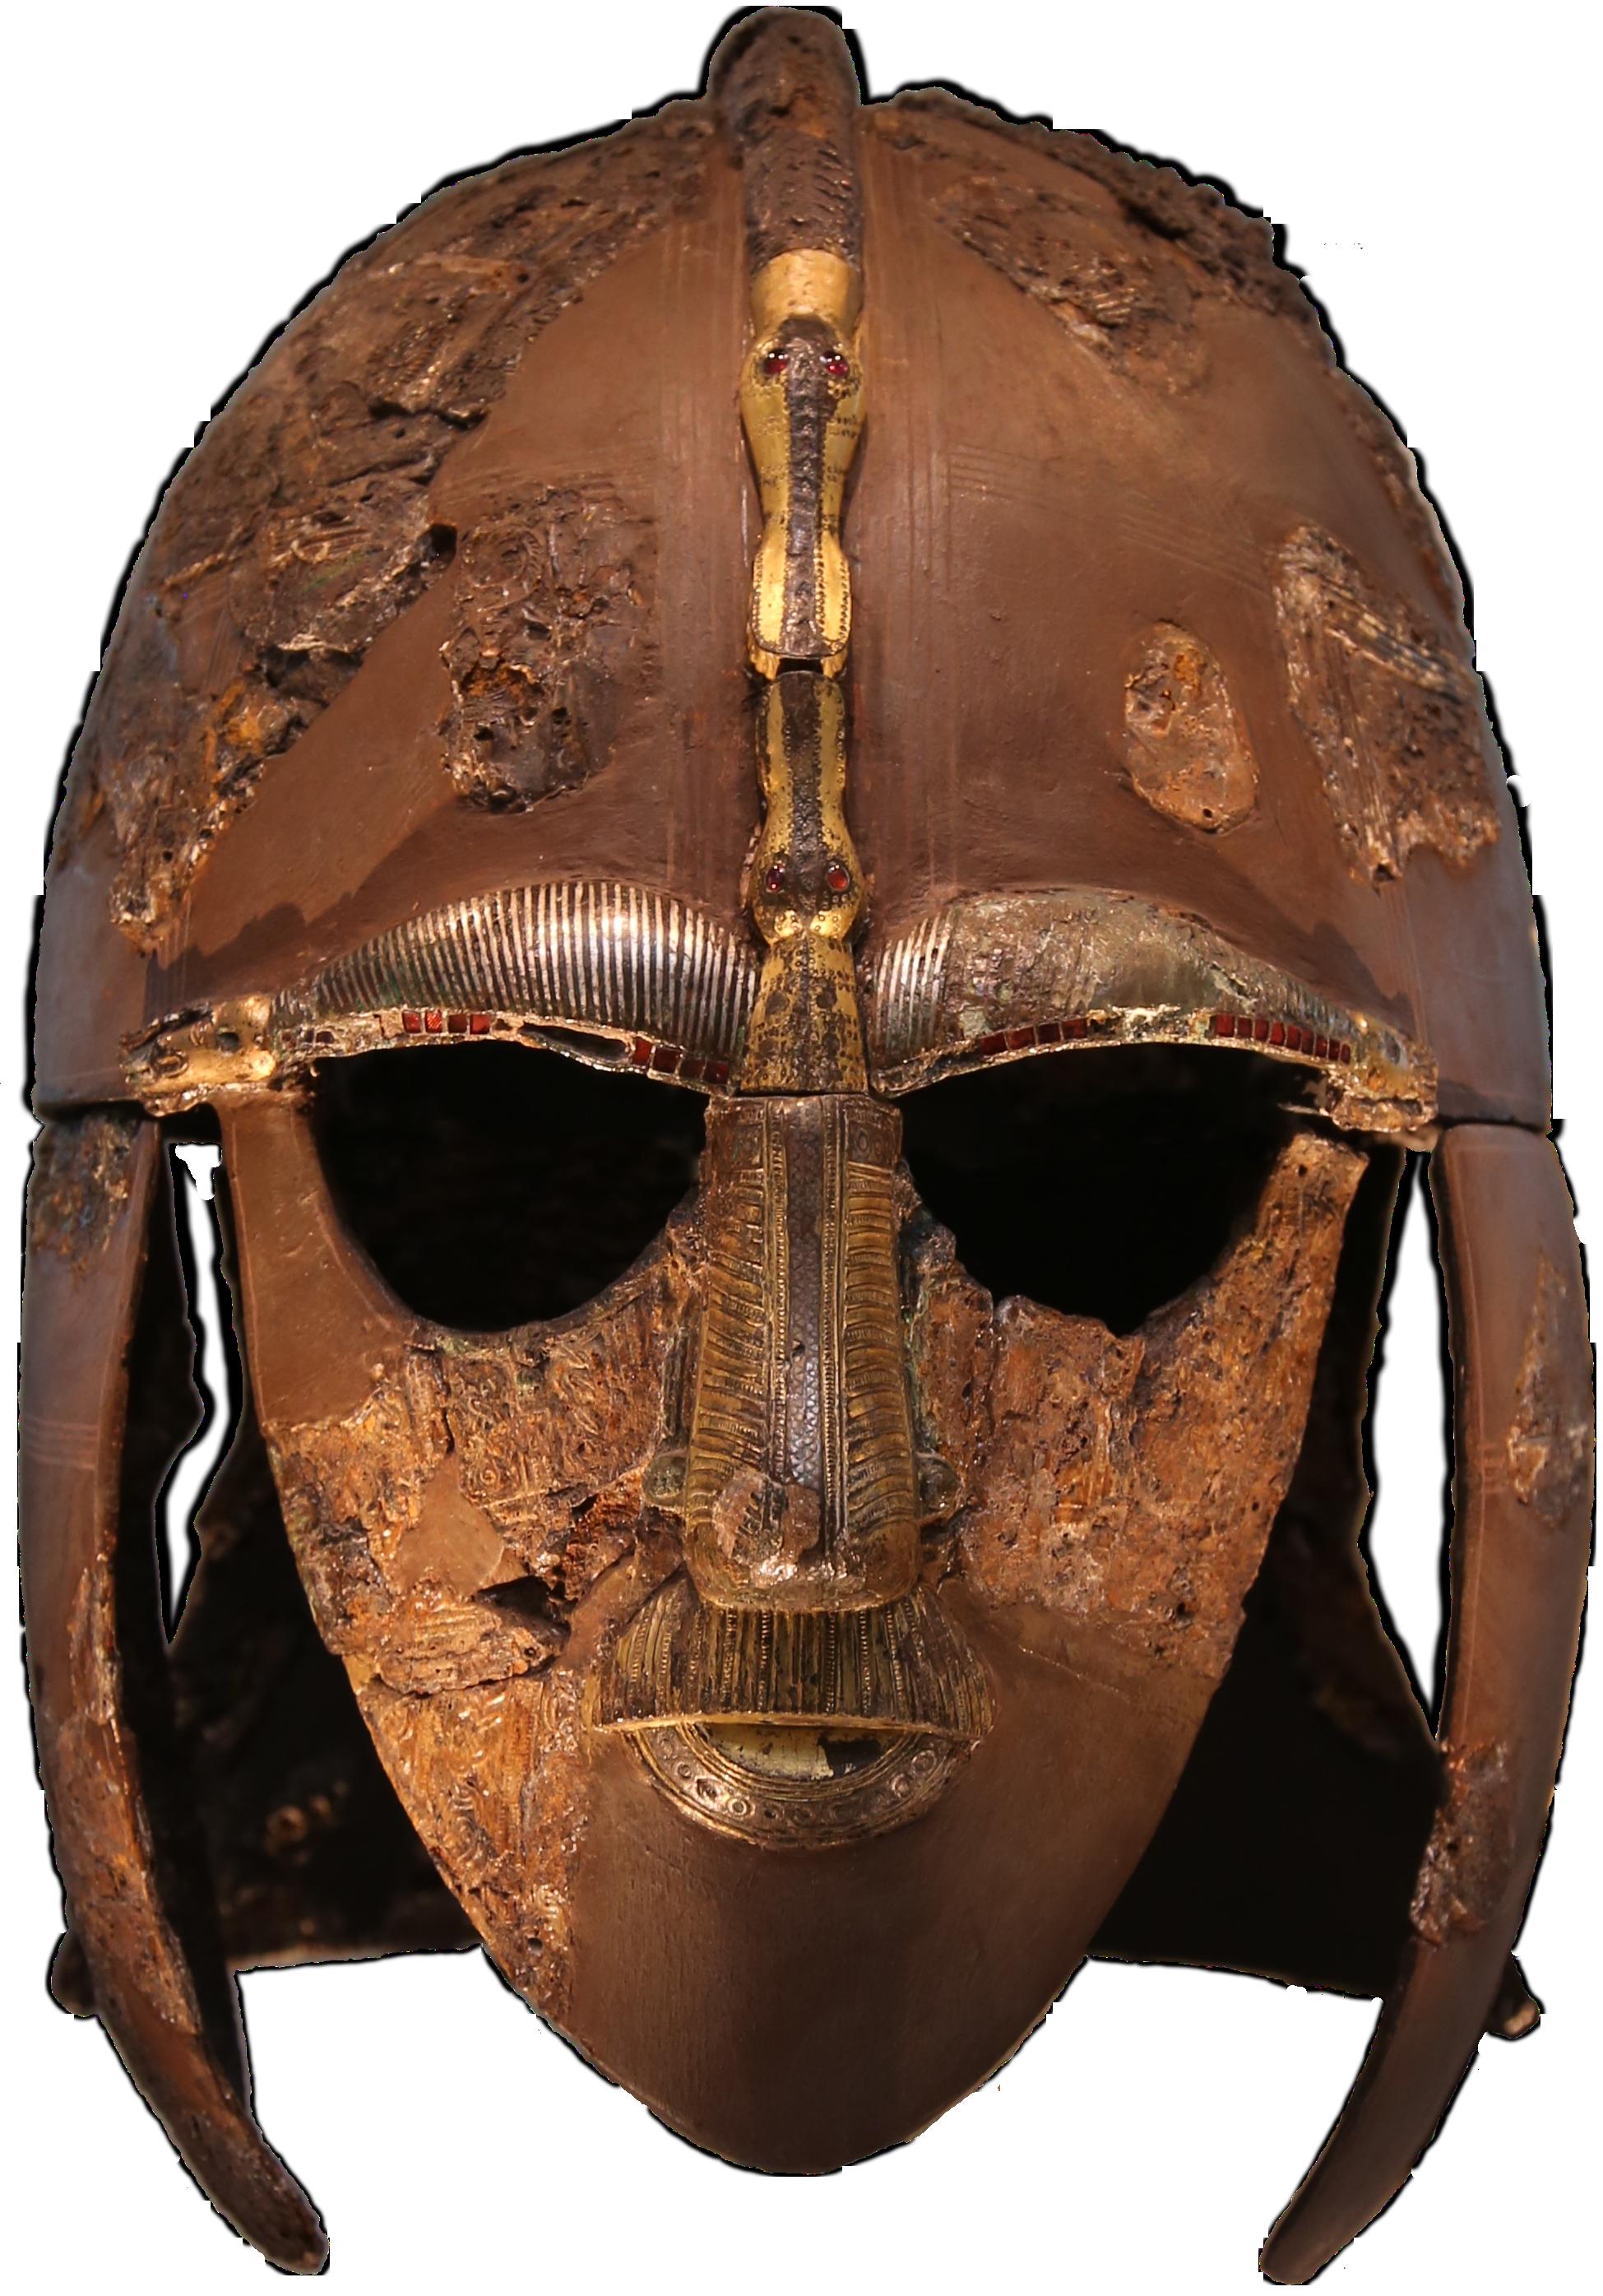 Fichier:Sutton Hoo helmet 2016.png — Wikipédia